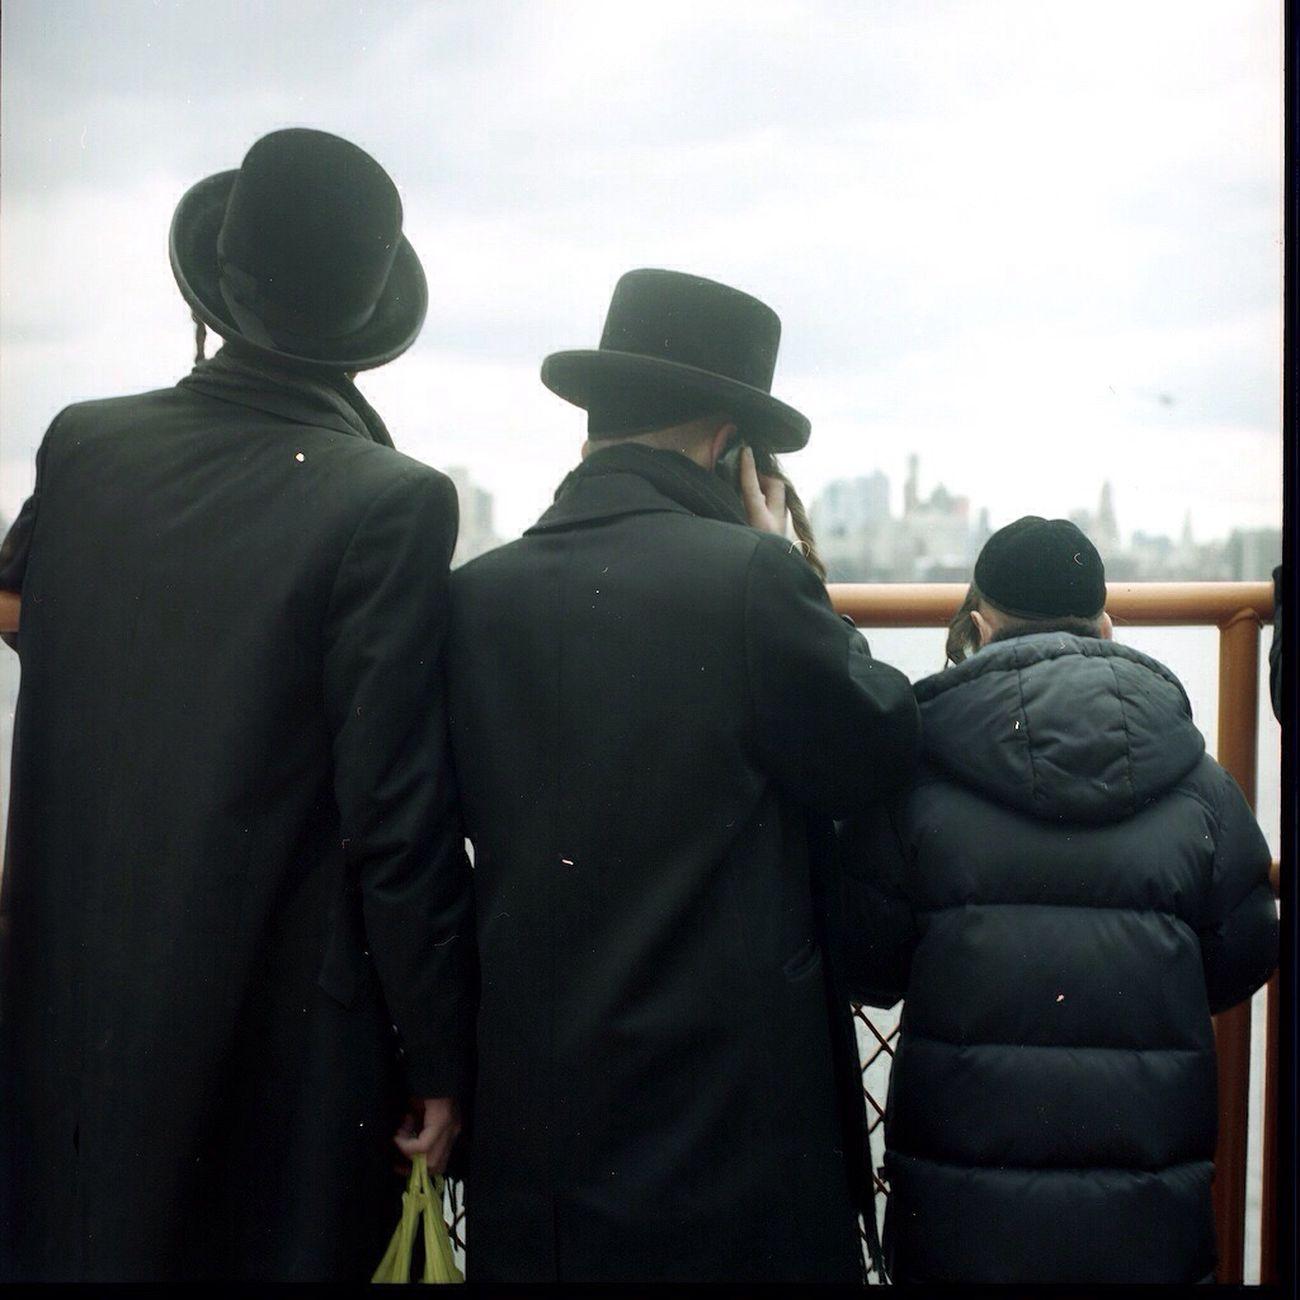 The Best Of New York Hudson River Orthodox Jews Back Colors Religion Hasselblad 6x6 Film David De La Cruz